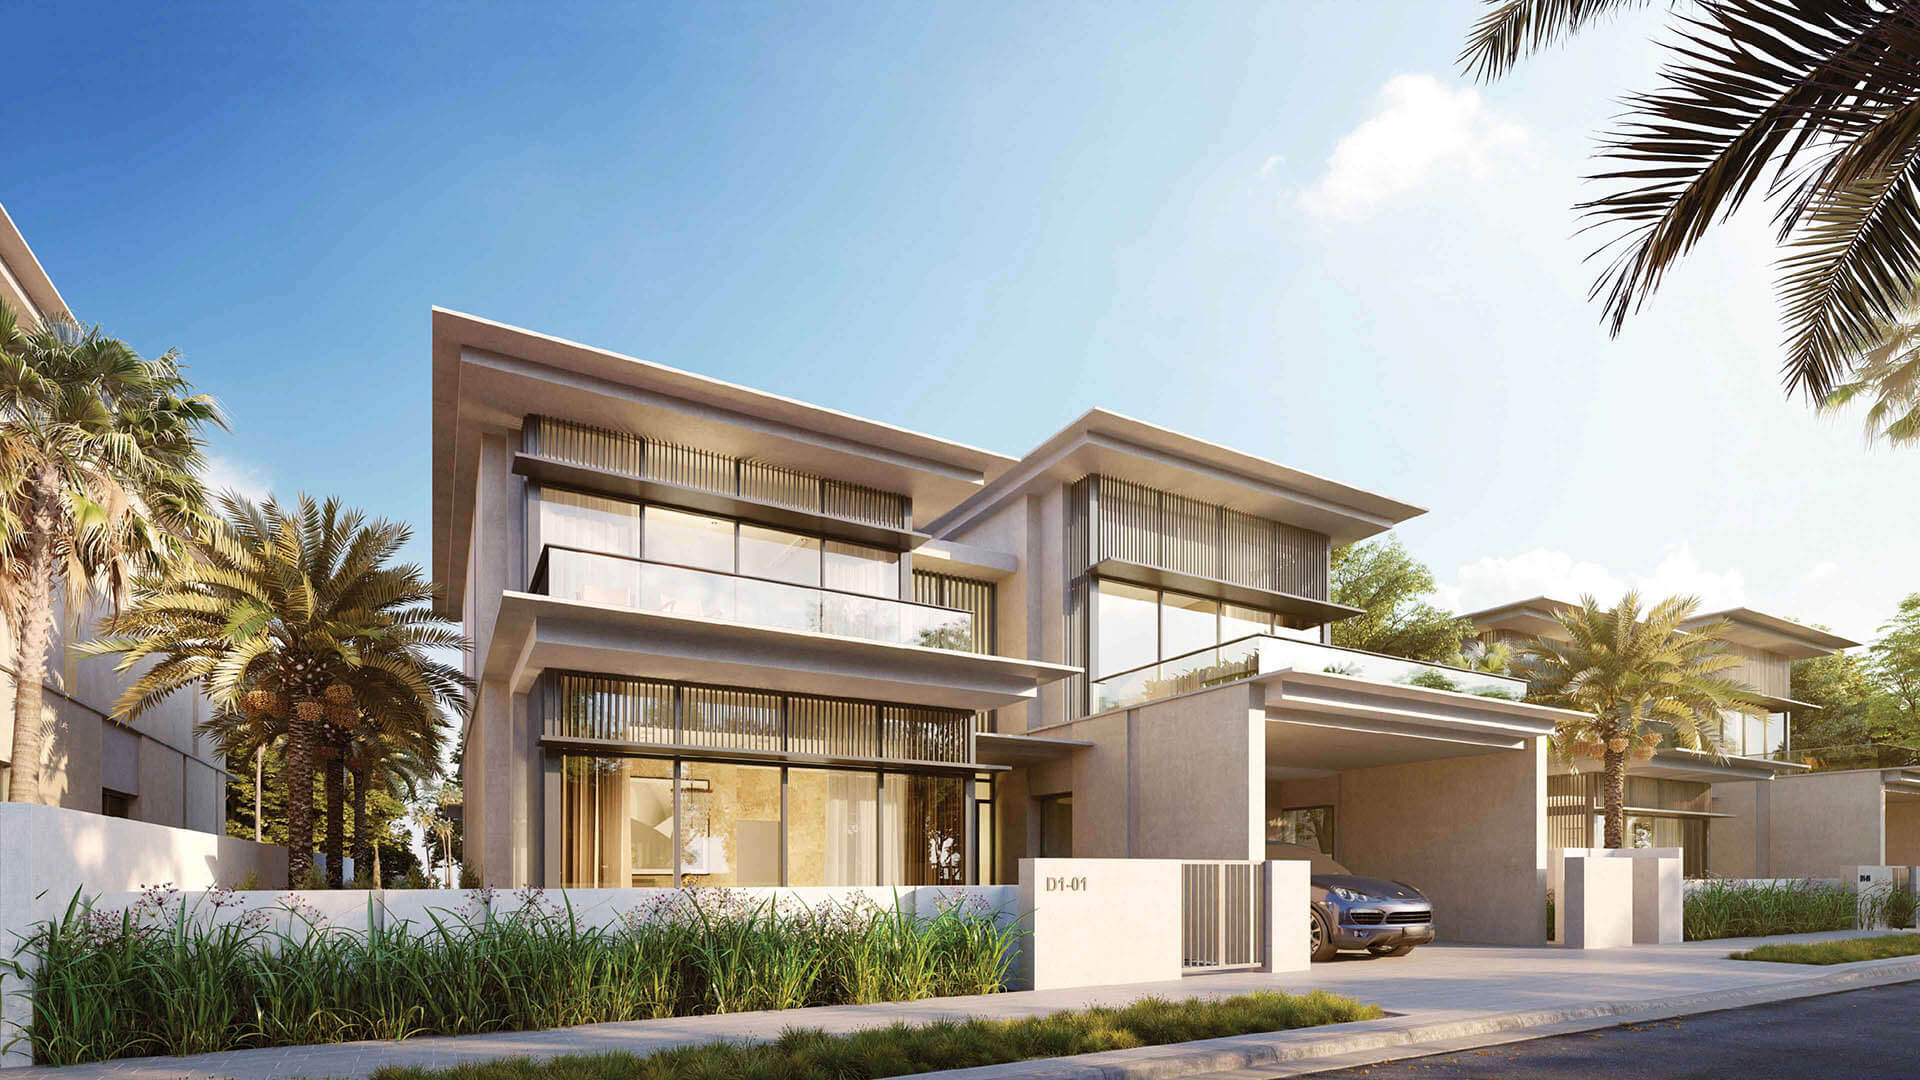 Dubai Hills Estate - 4